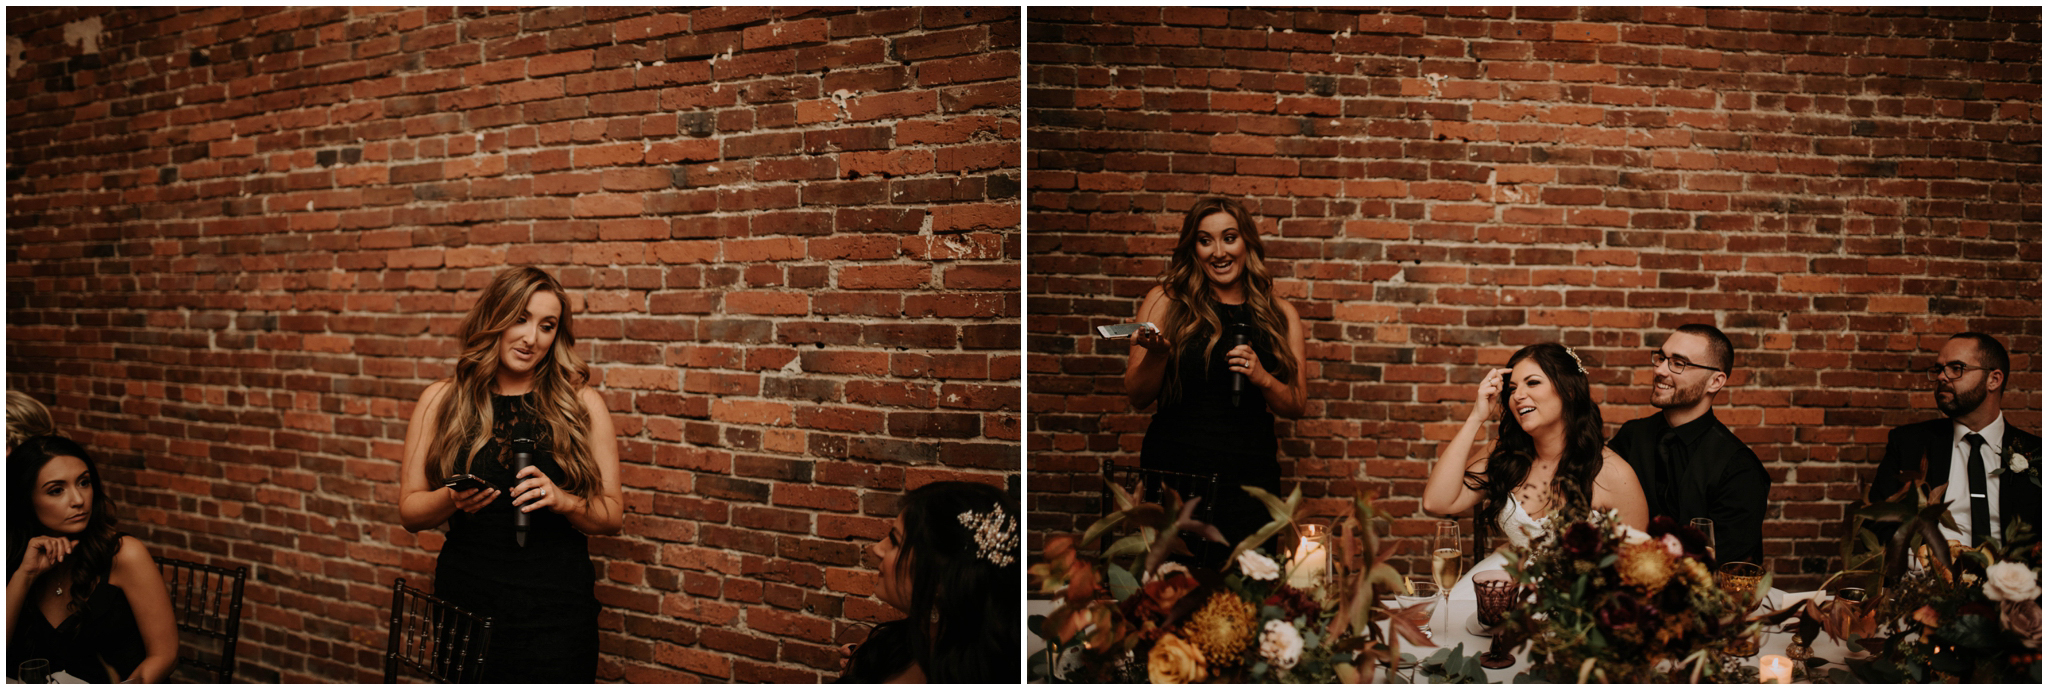 danny+mackenzie+downtown-seattle-axis-wedding-seattle-photographer-105.jpg